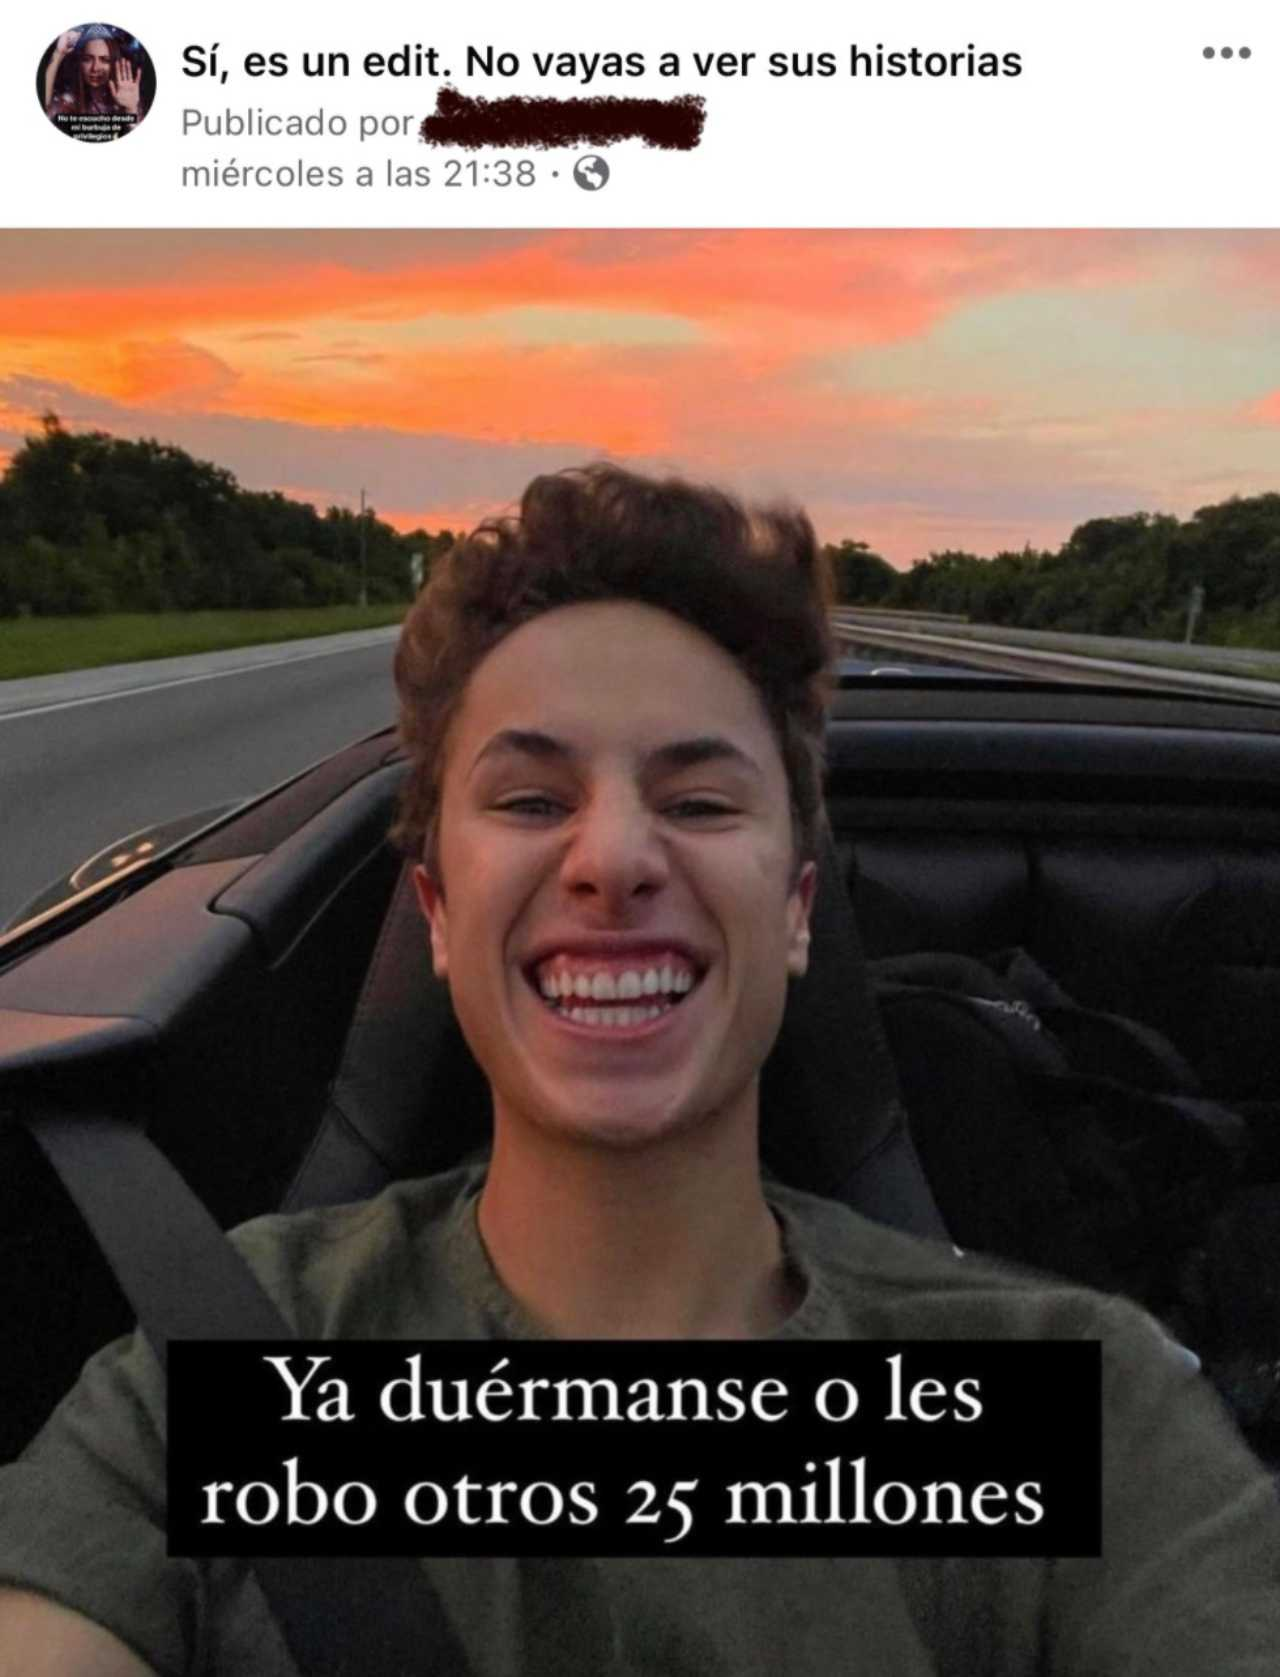 Meme de la muerte del influencer Juanpa Zurita